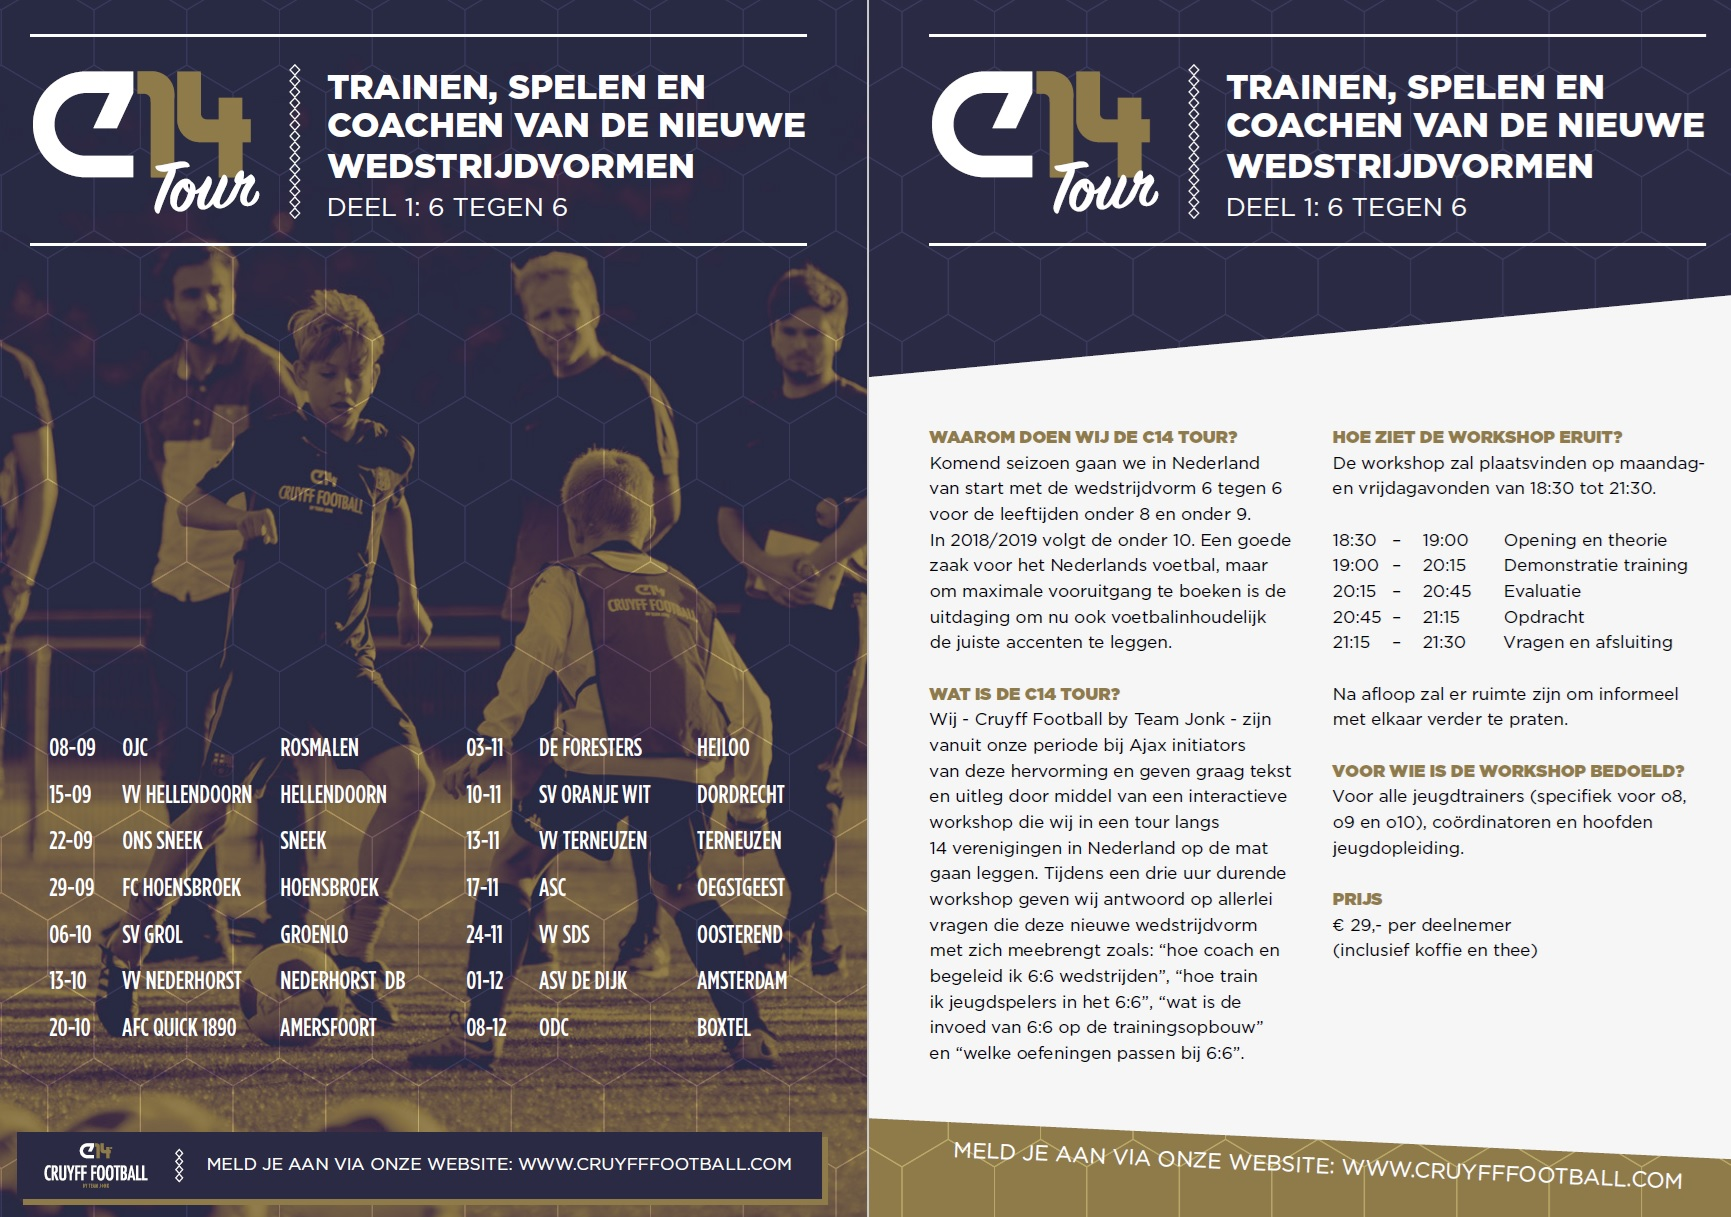 Cruyff Football: workshops over 6:6